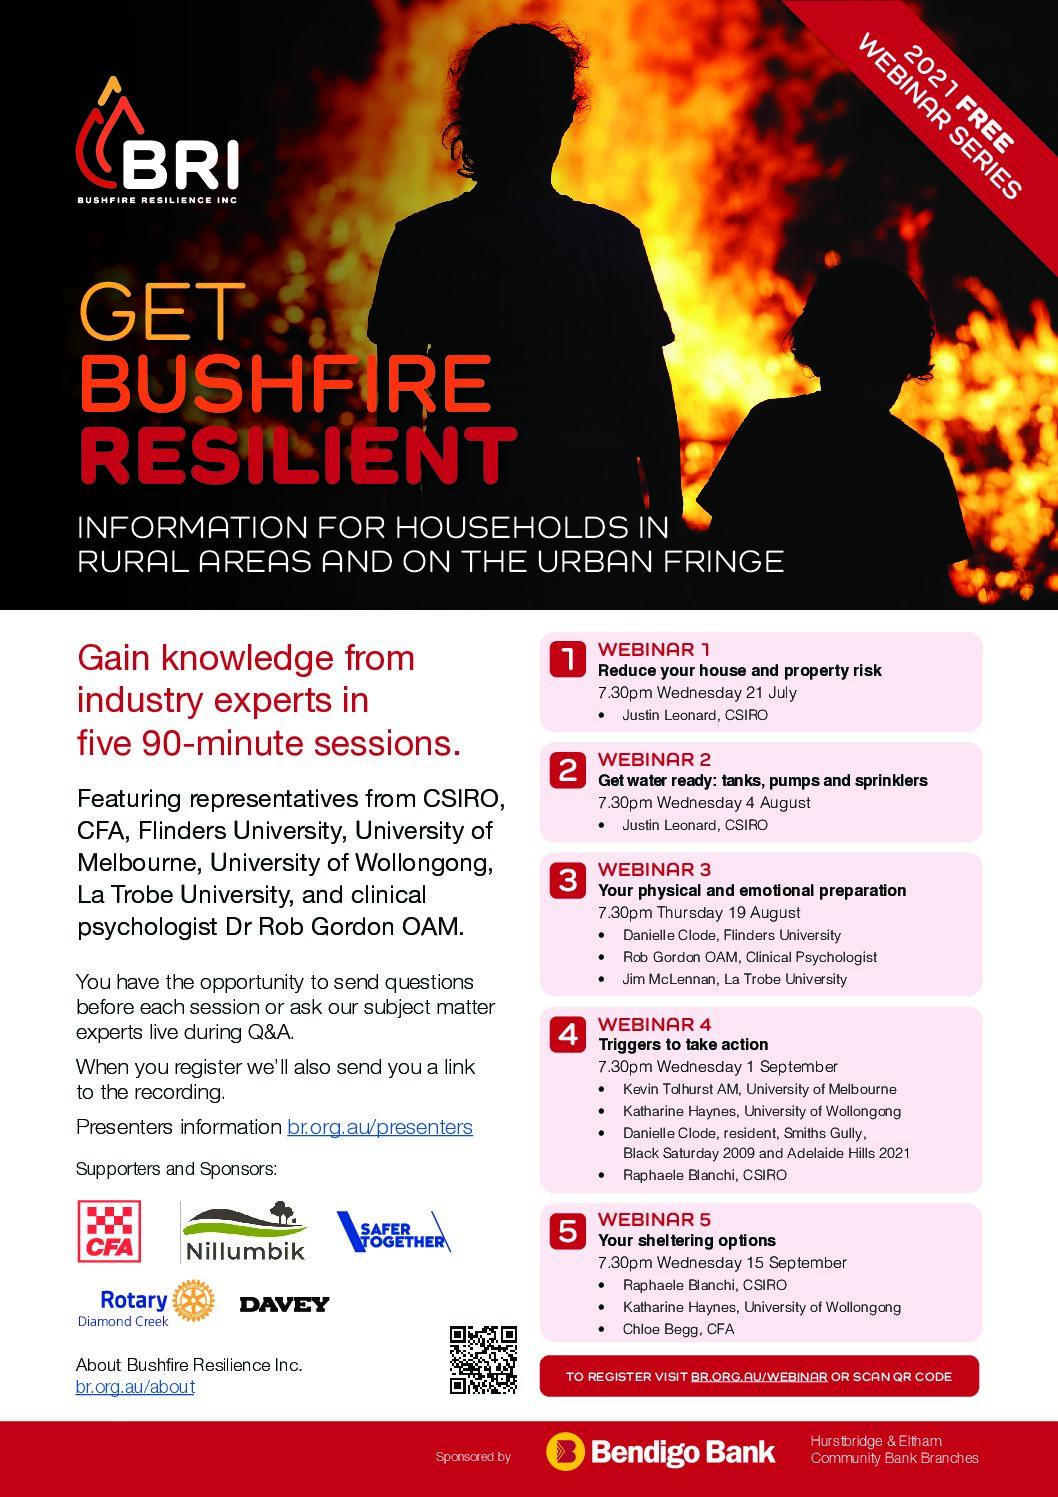 Bushfire Resilience Inc 2021 Webinar Series